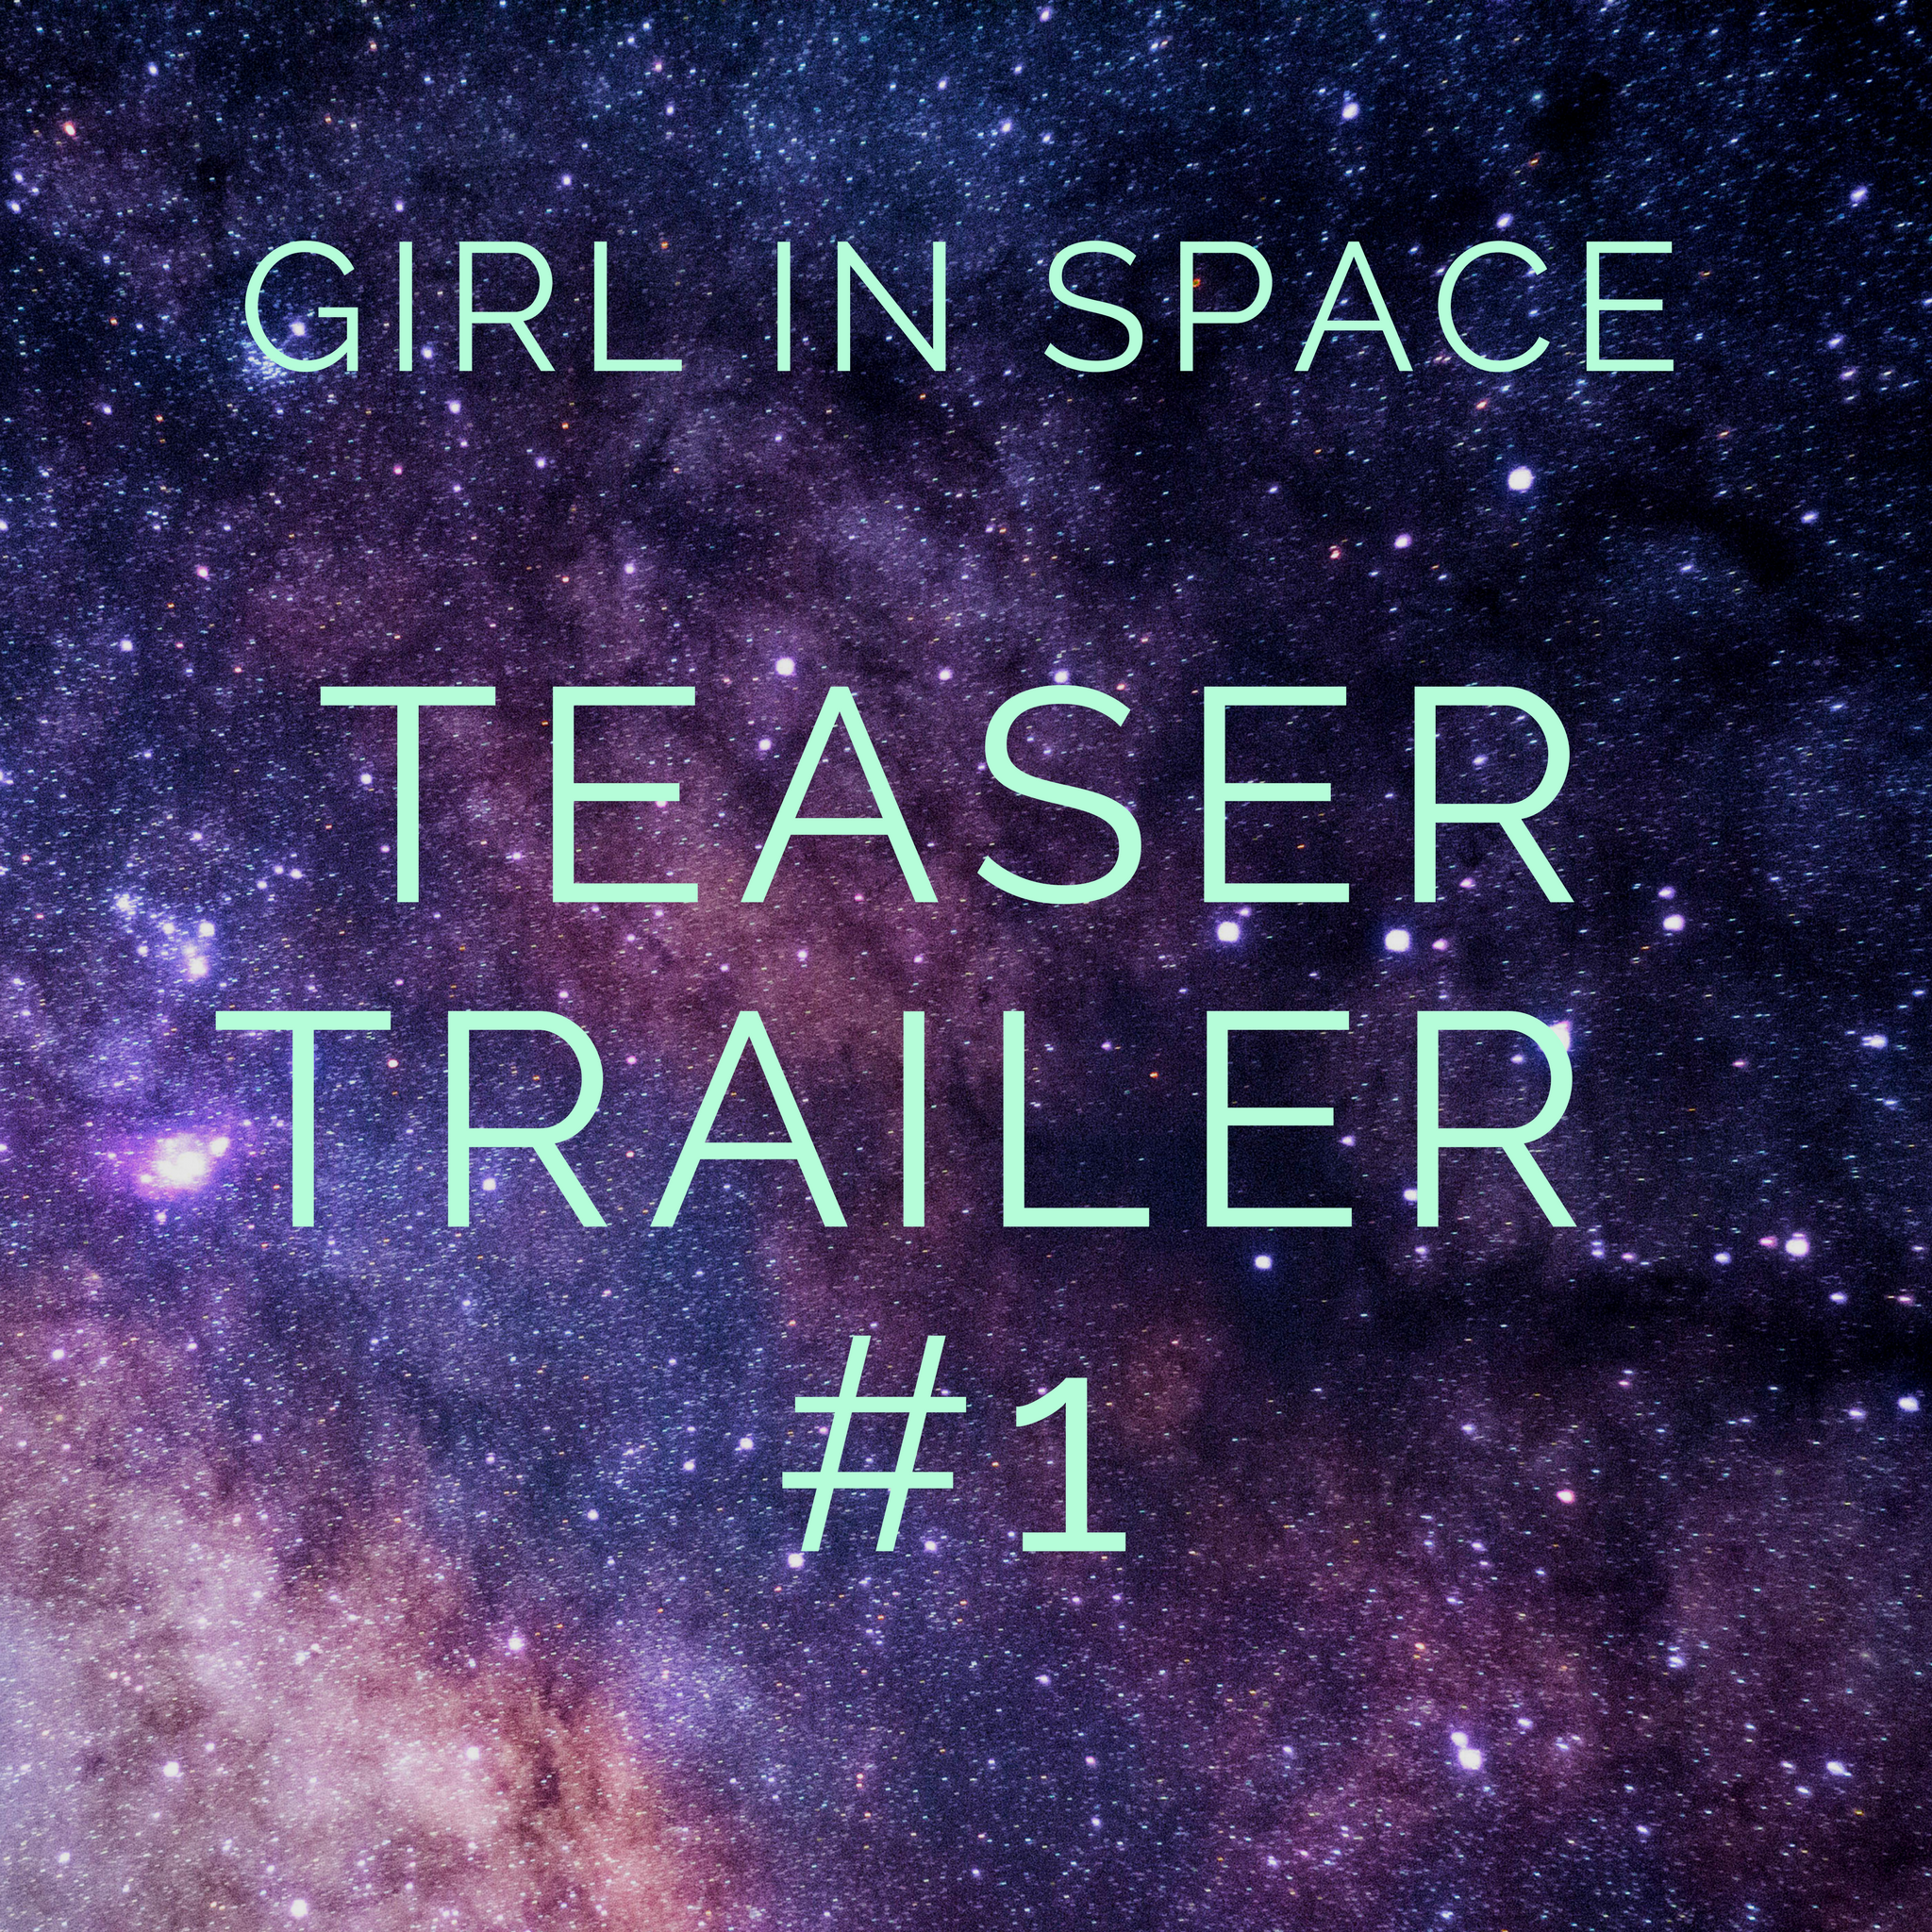 Trailer 001: A Blip